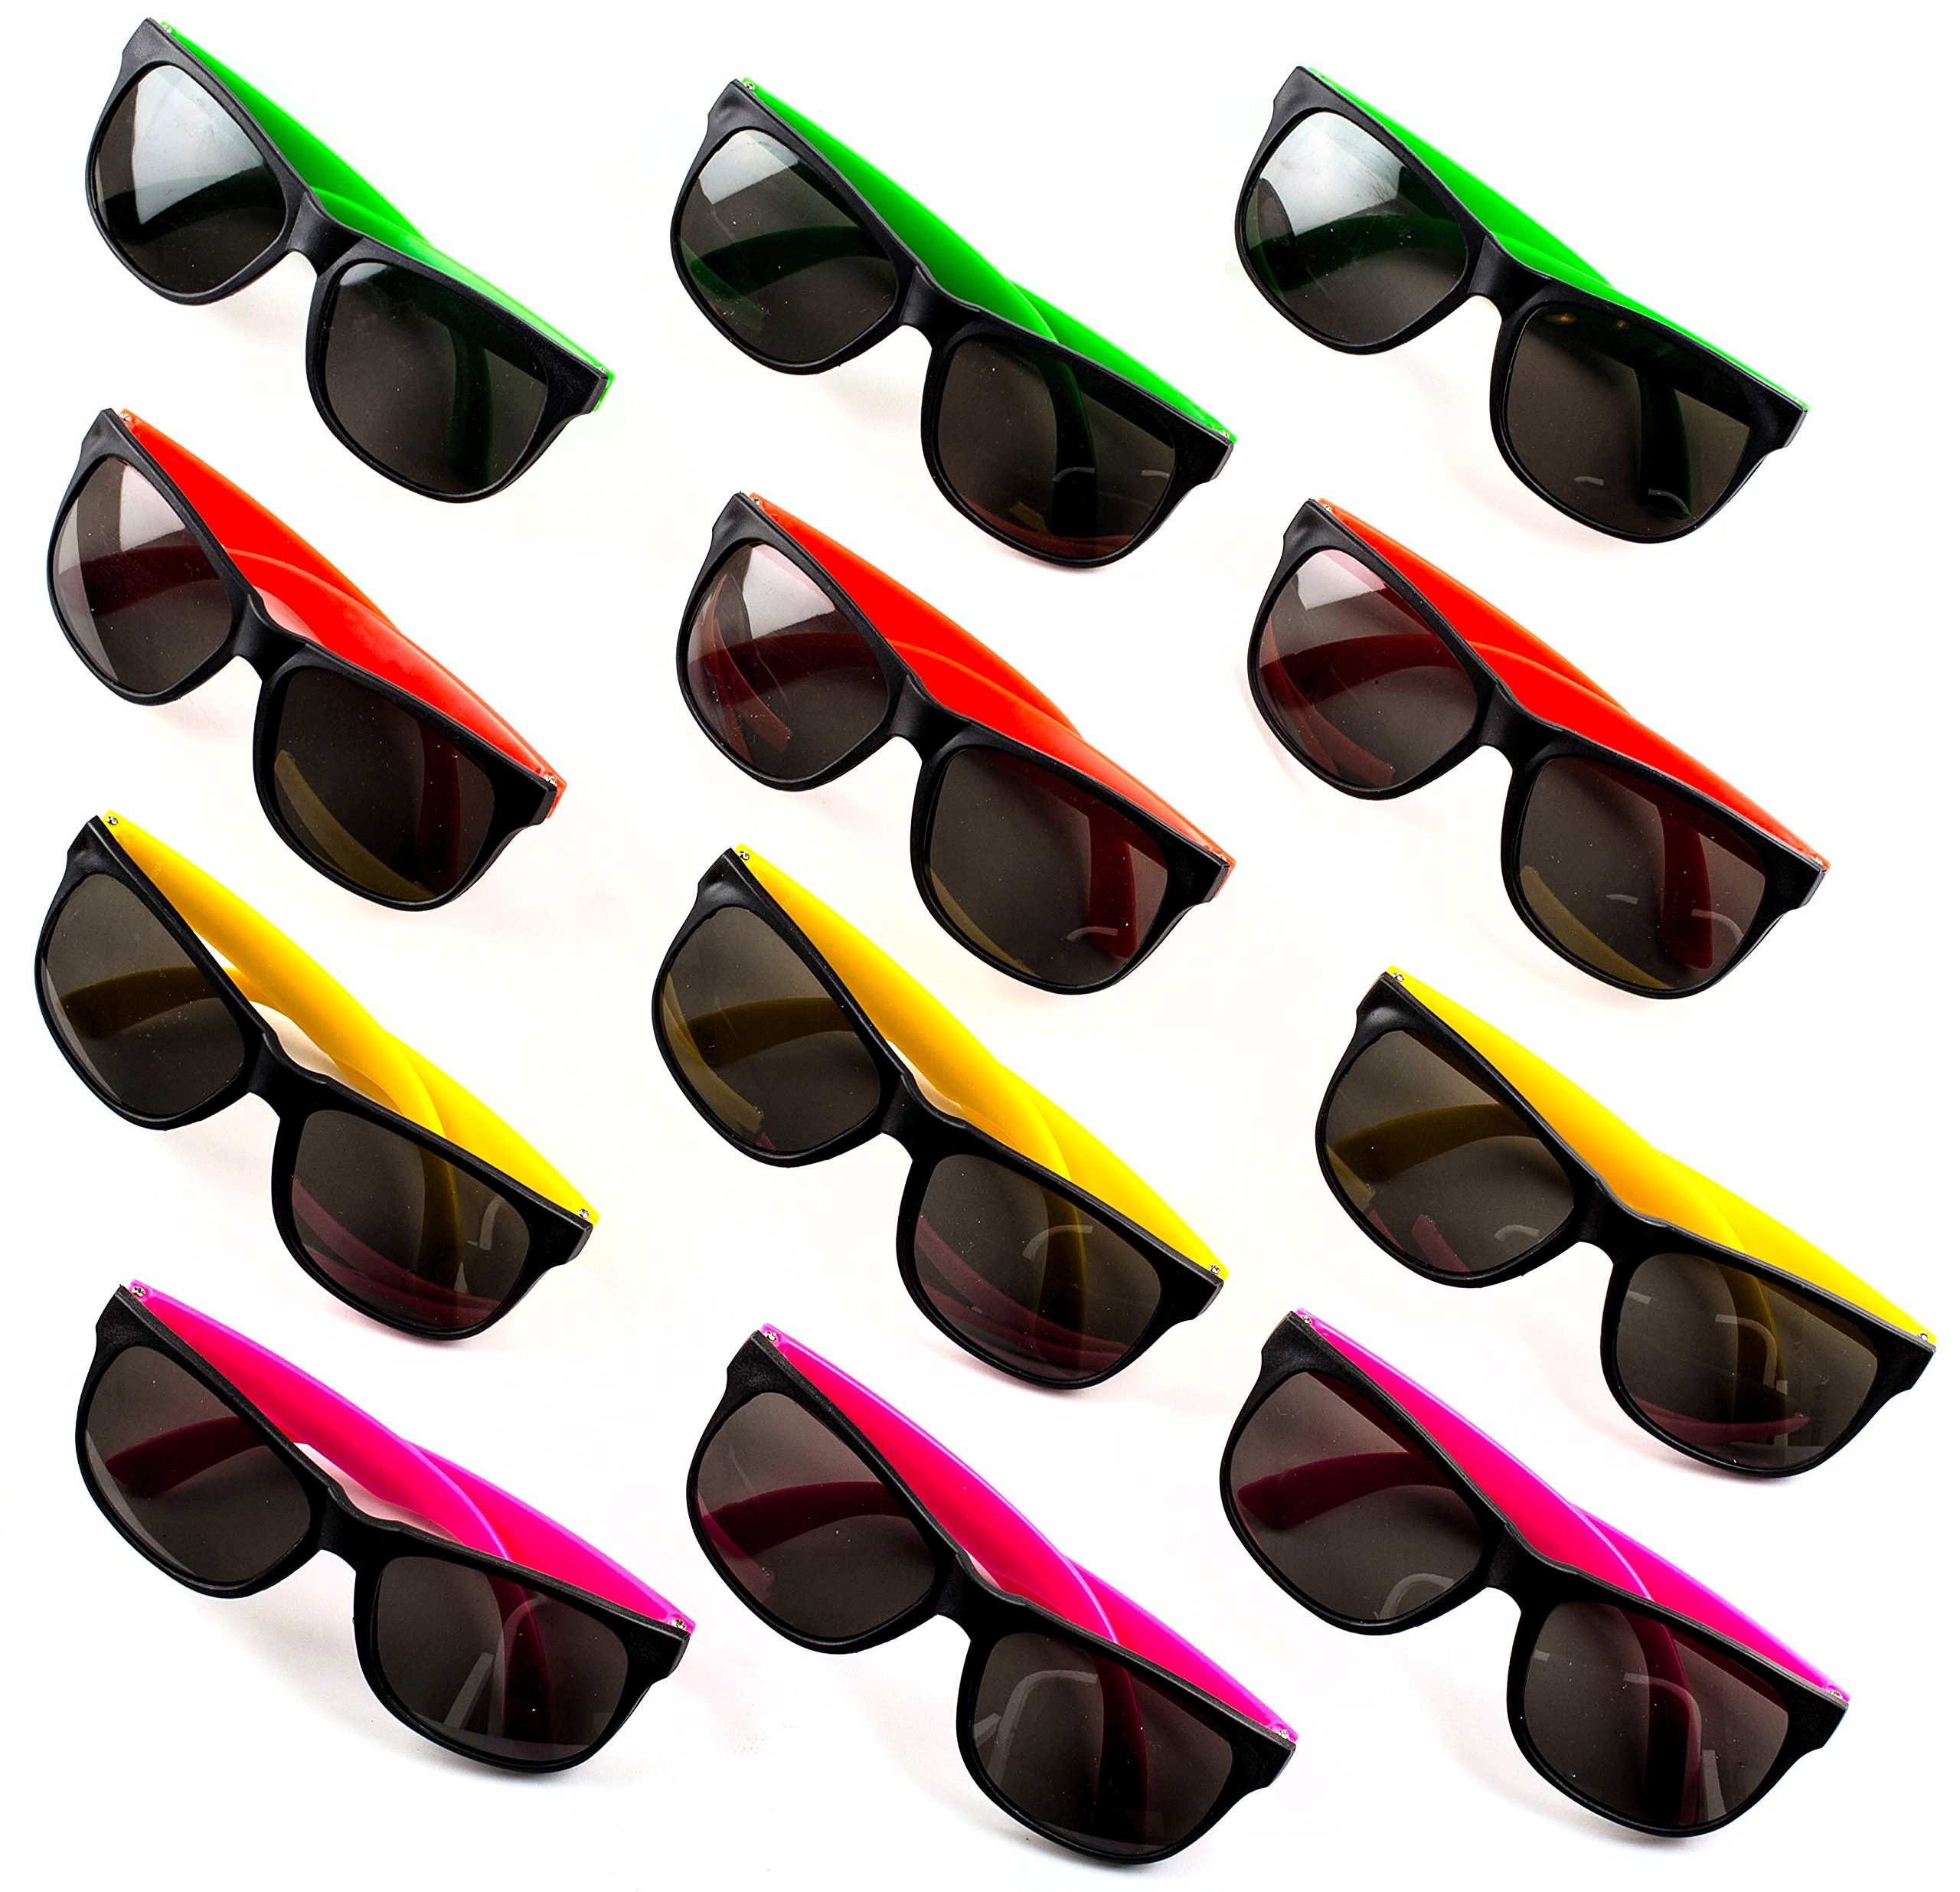 Neliblu Neon Bulk Kids Sunglasses Party Favors - 24 Pack - Bulk Pool Party Favors, Goody Bag Fillers, Beach Party Favors, Bulk Party Pack of 2 Dozen by Neliblu